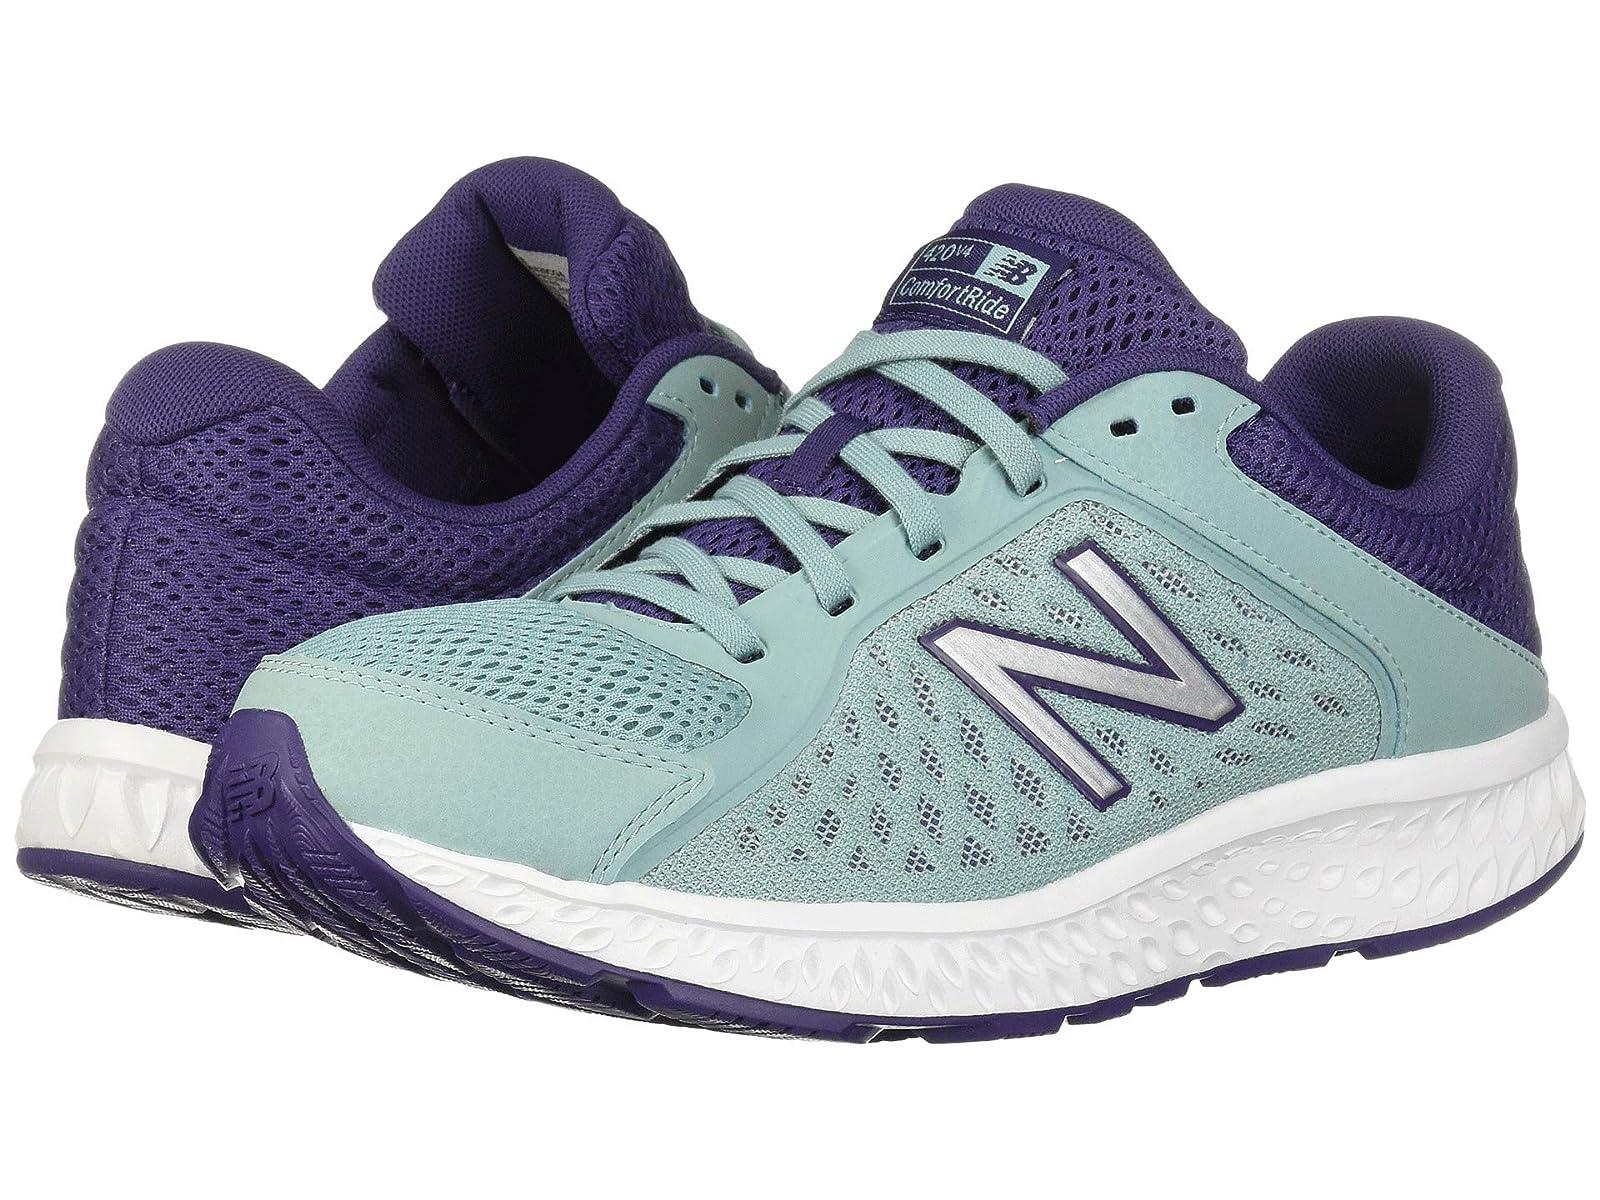 New Balance 420v4Atmospheric grades have affordable shoes